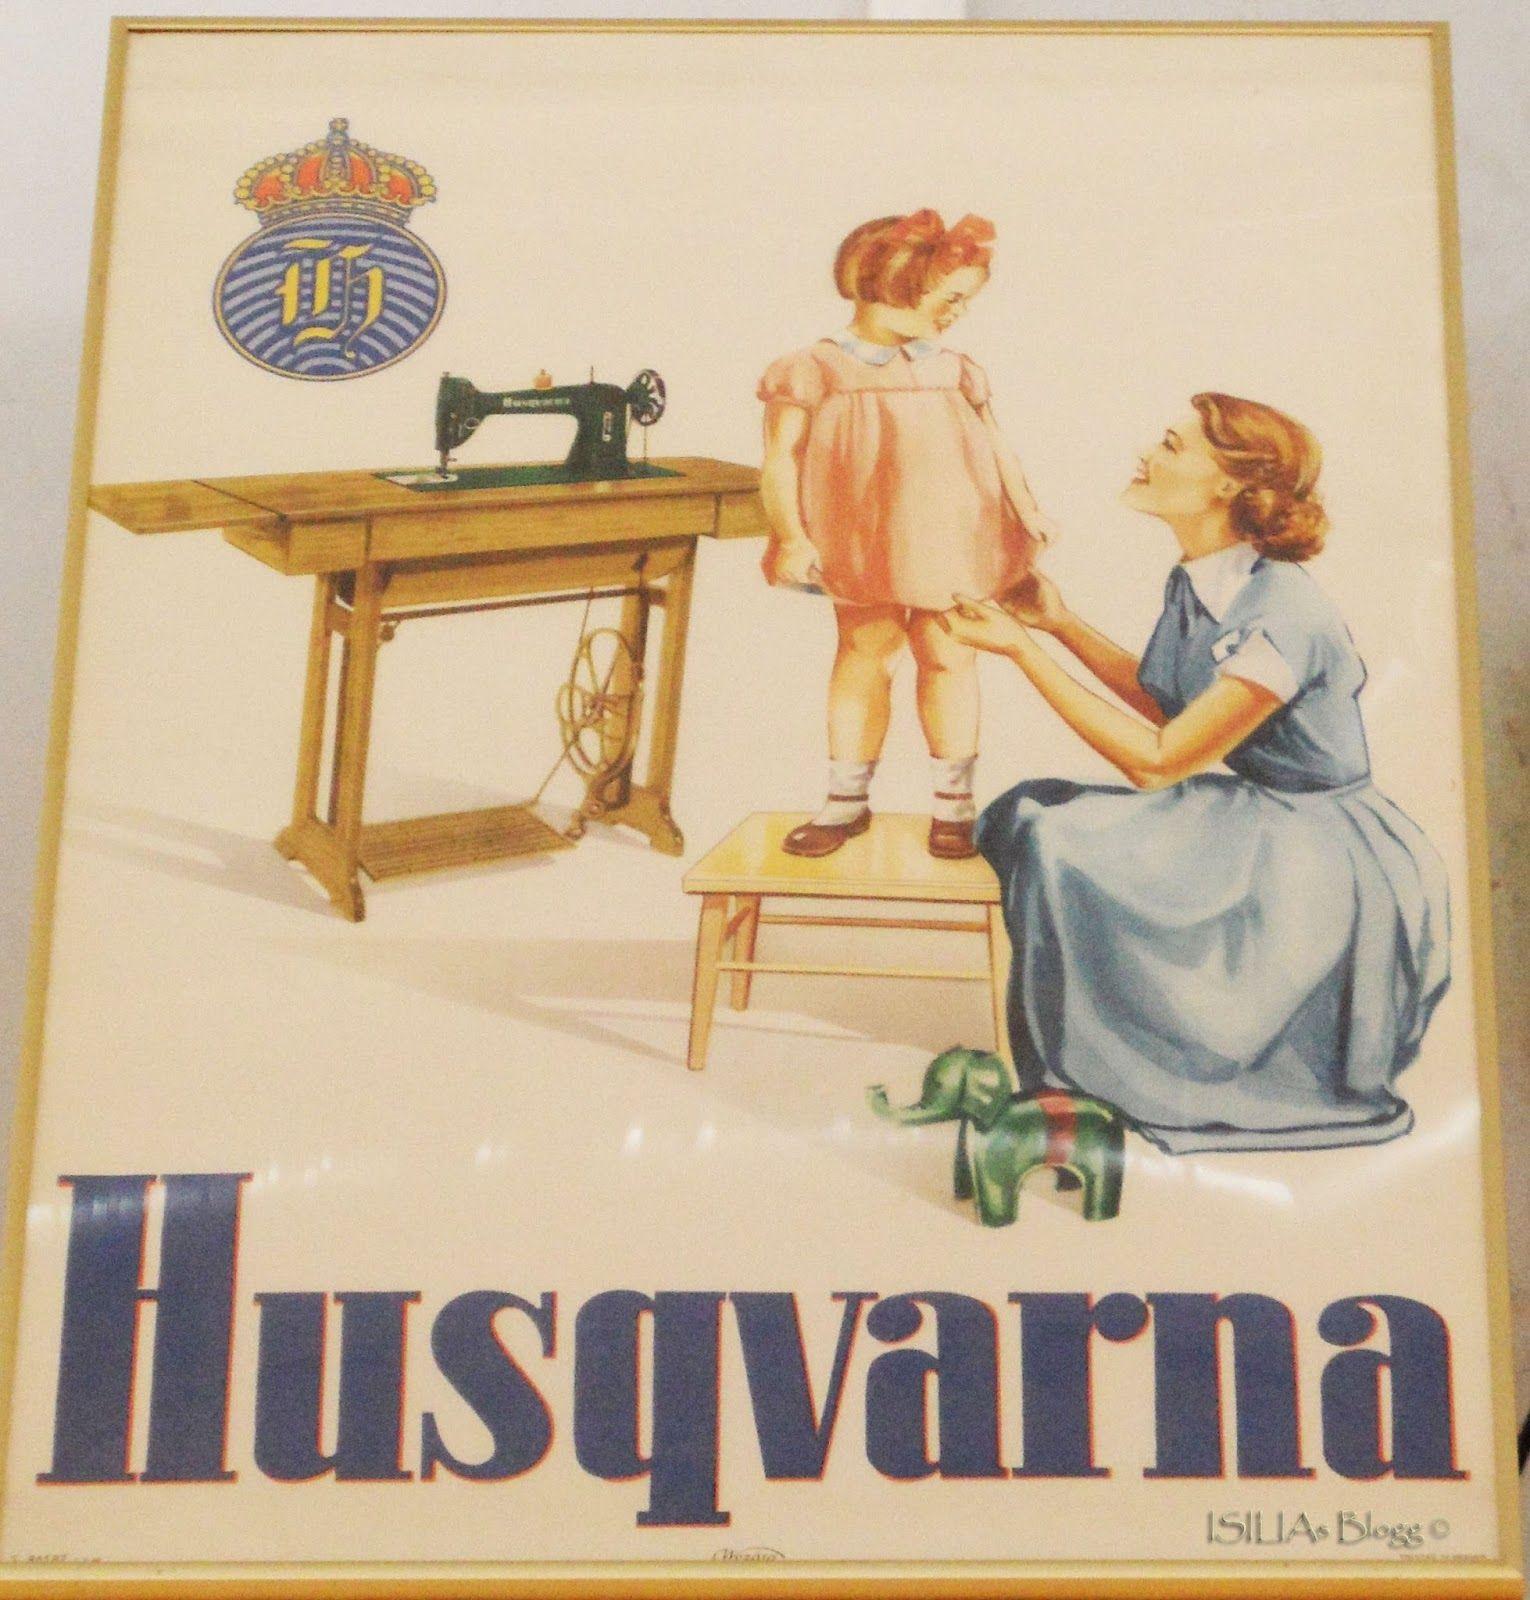 Electra Sew Sewing Fashion Machine Lady Fine Vintage Poster Repro FREE SHIP//USA